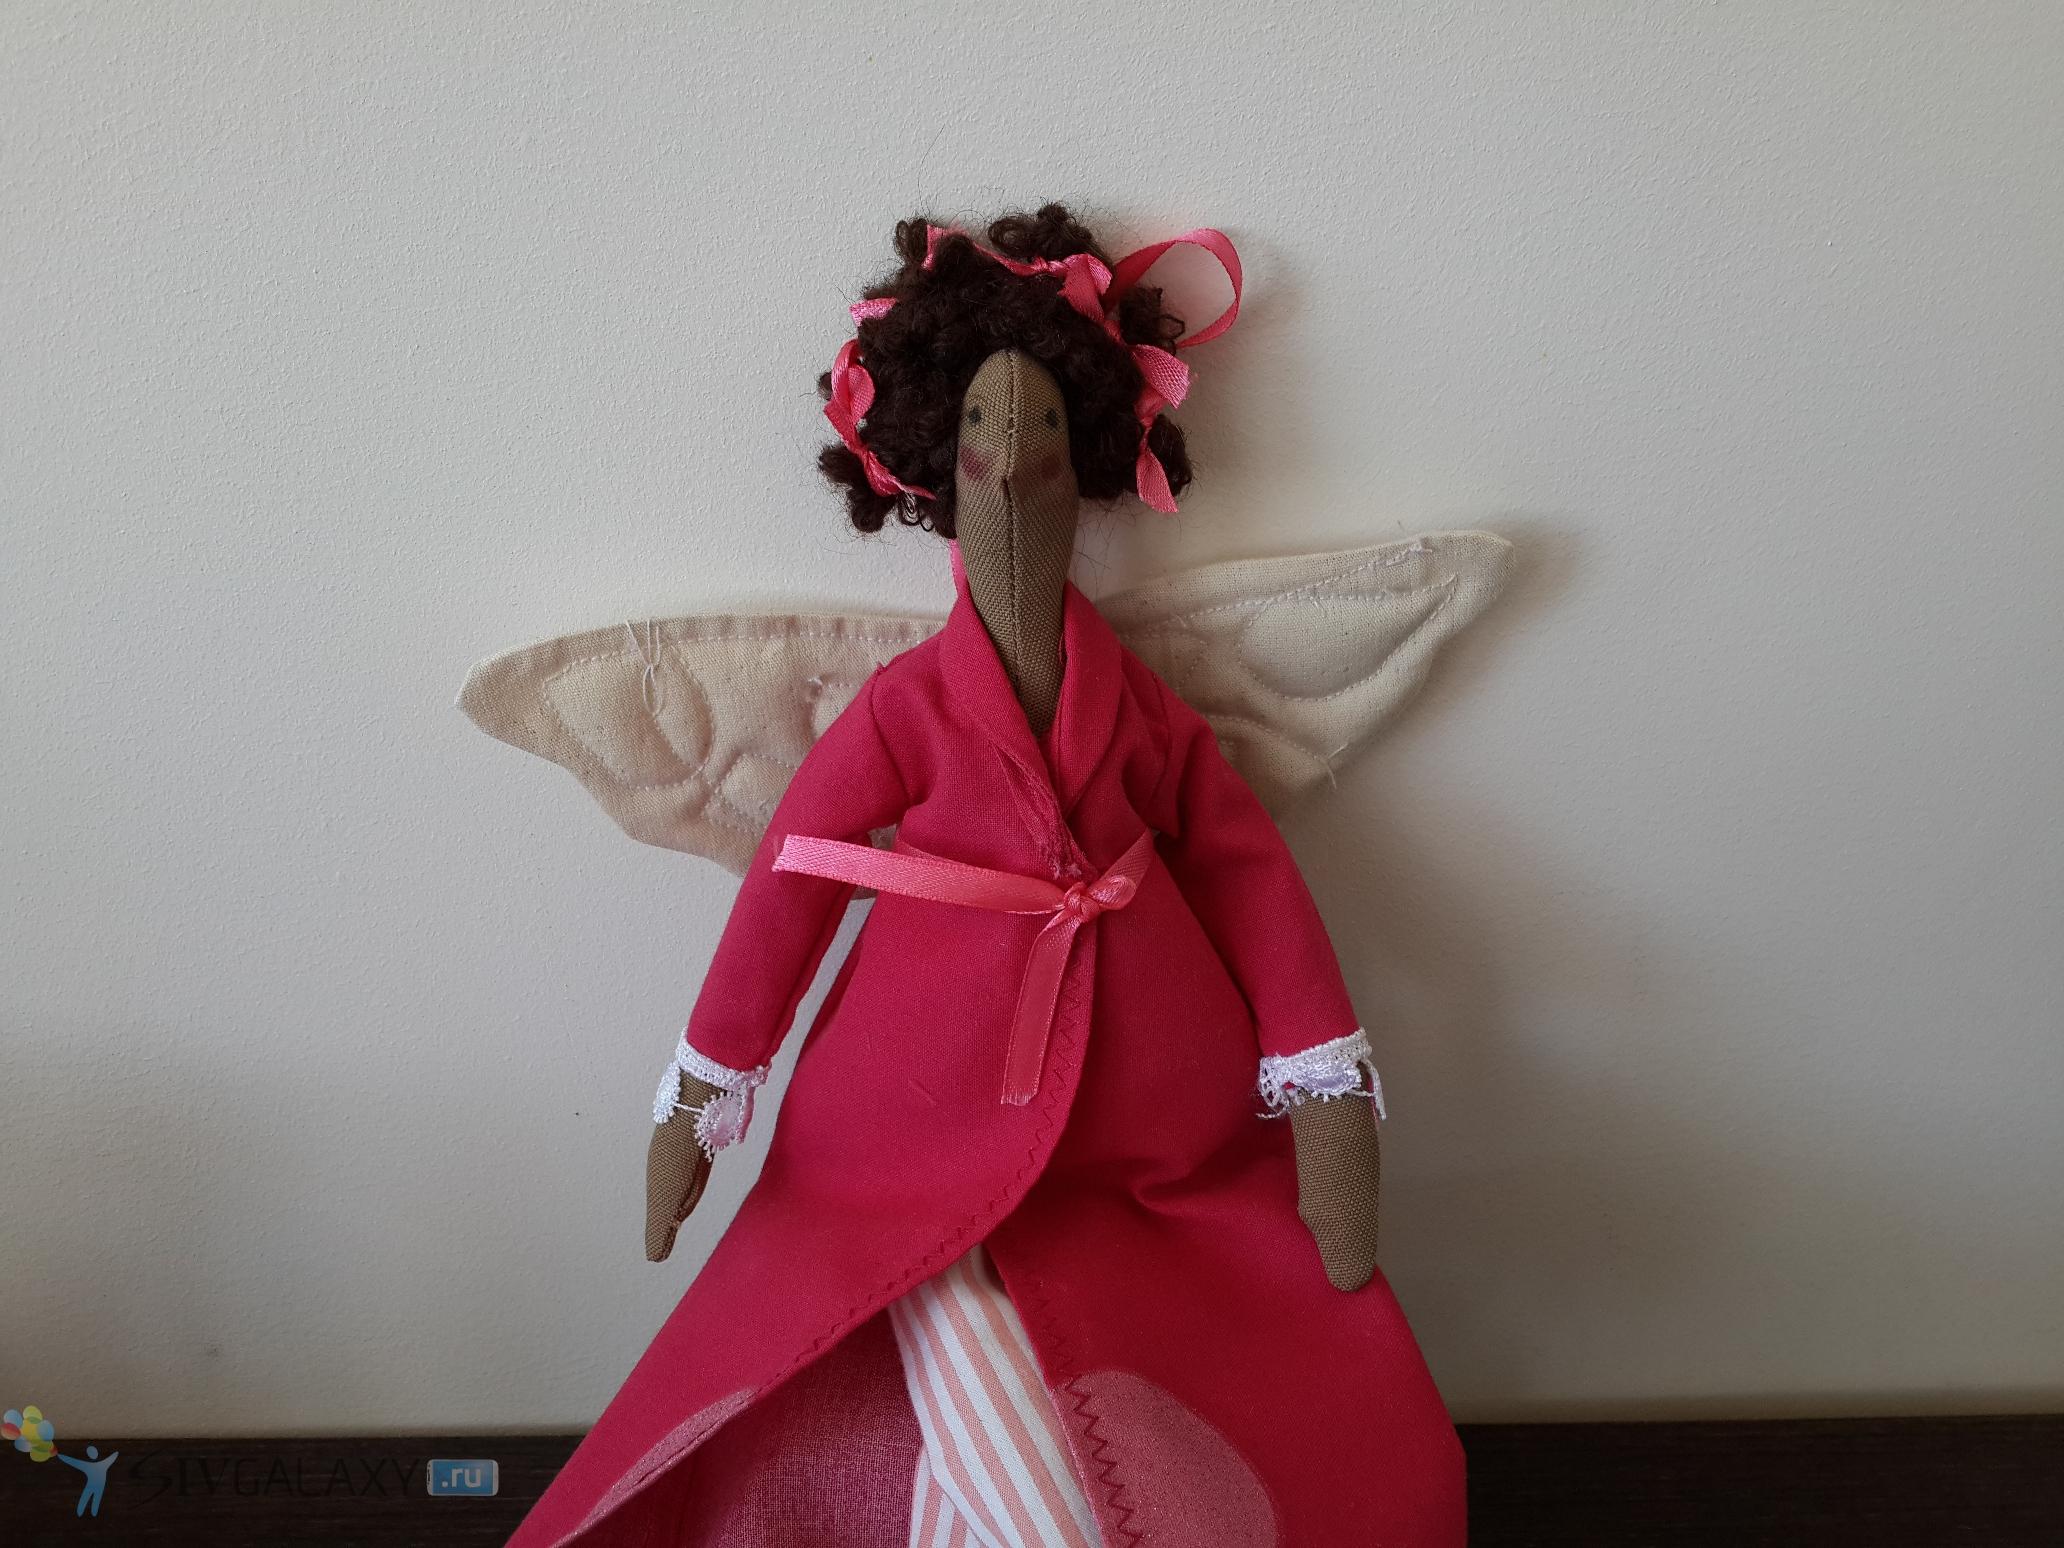 Фото с камеры Samsung Galaxy S4 - куколка